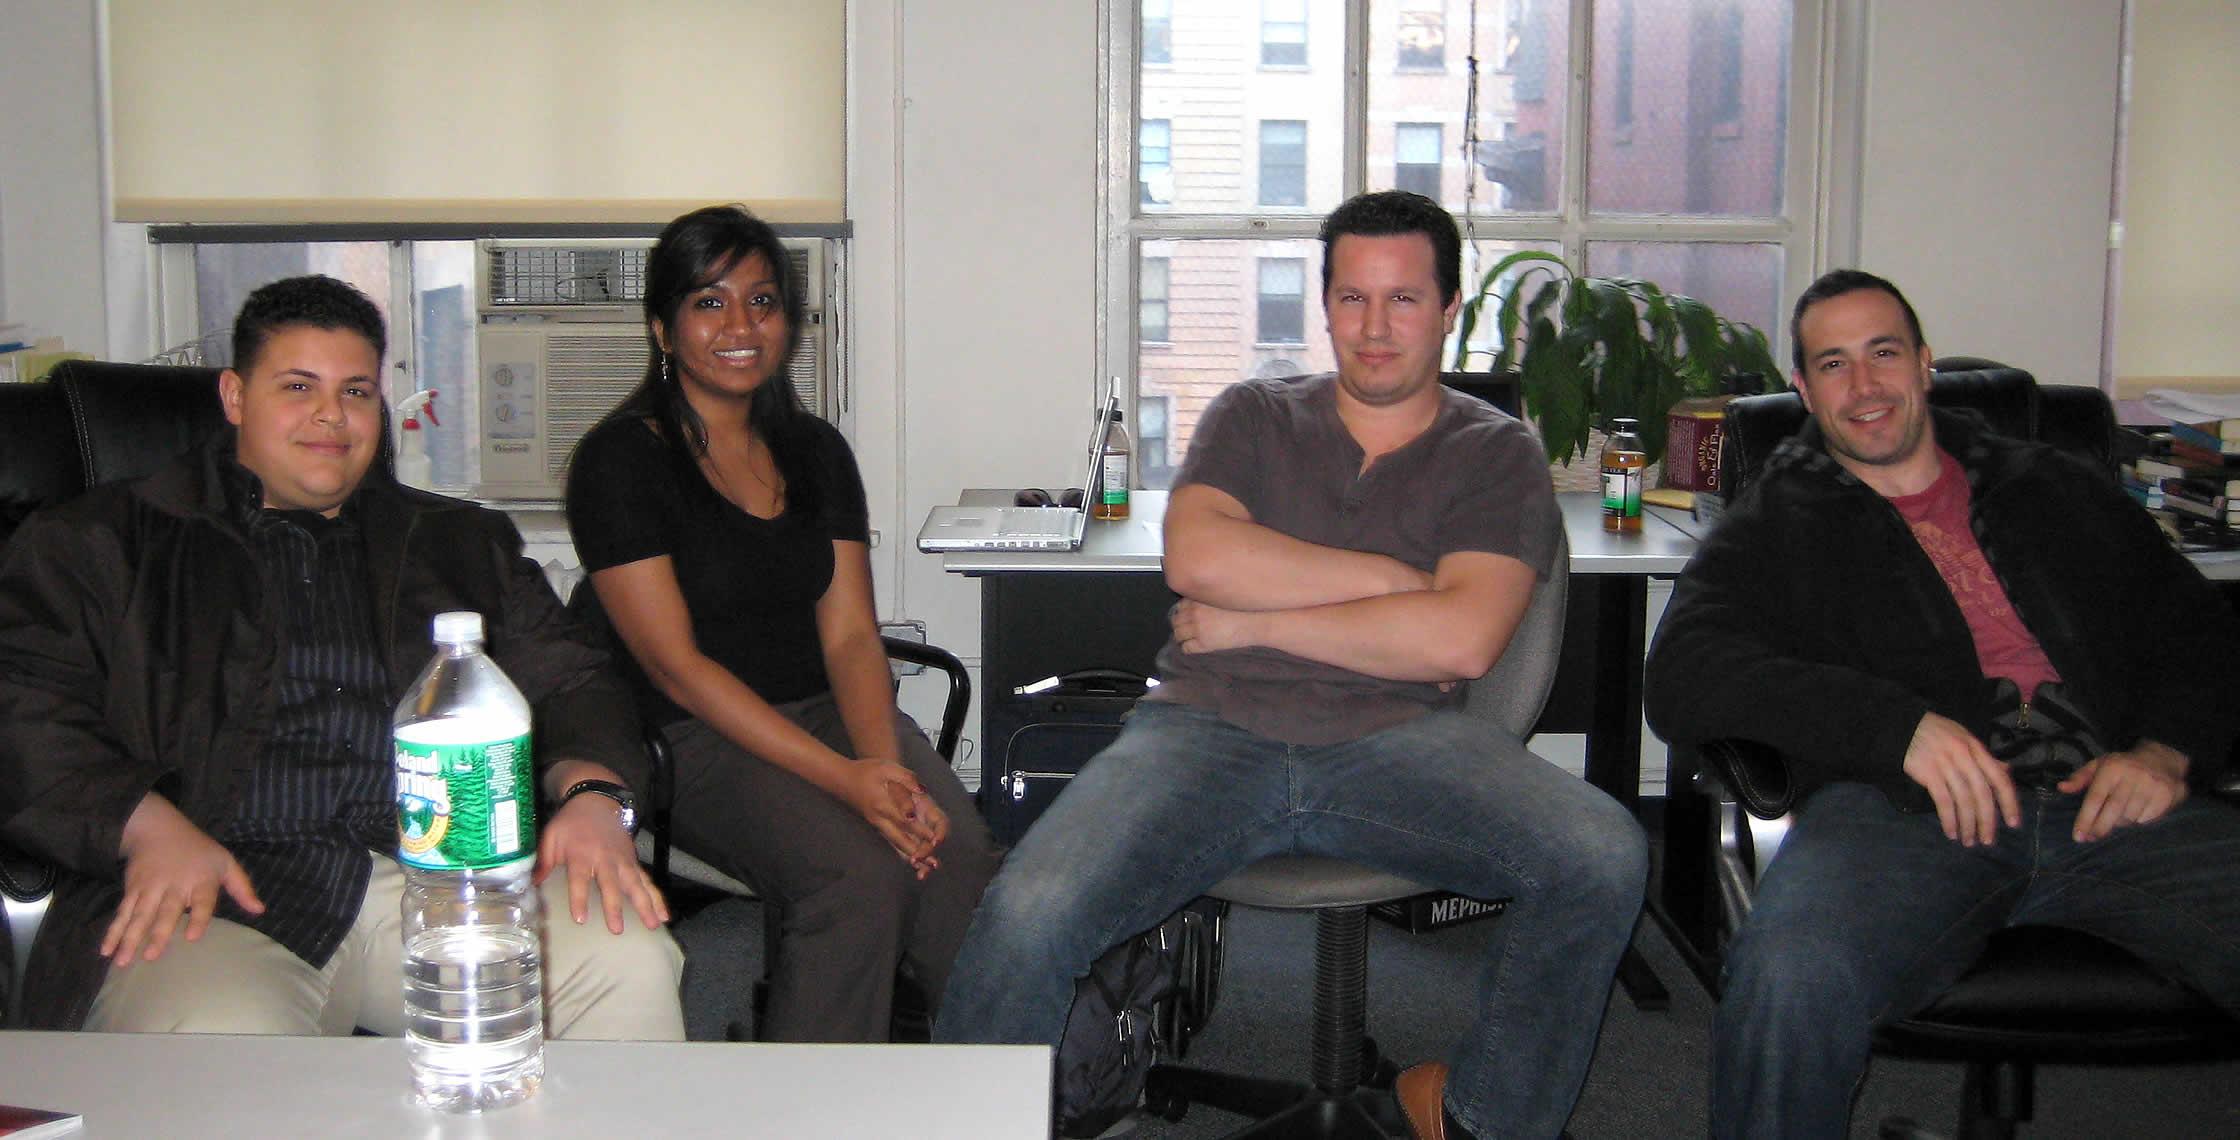 Ben Nadel at the New York ColdFusion User Group (Apr. 2008) with: Clark Valberg and Nafisa Sabu and Rob Gonda